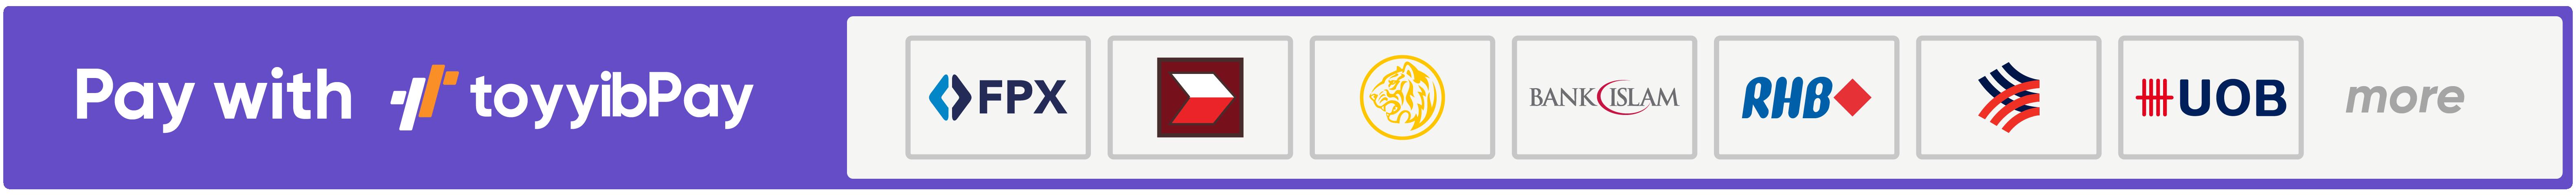 Bayar Guna FPX Online Banking atau Kad Debit/Credit